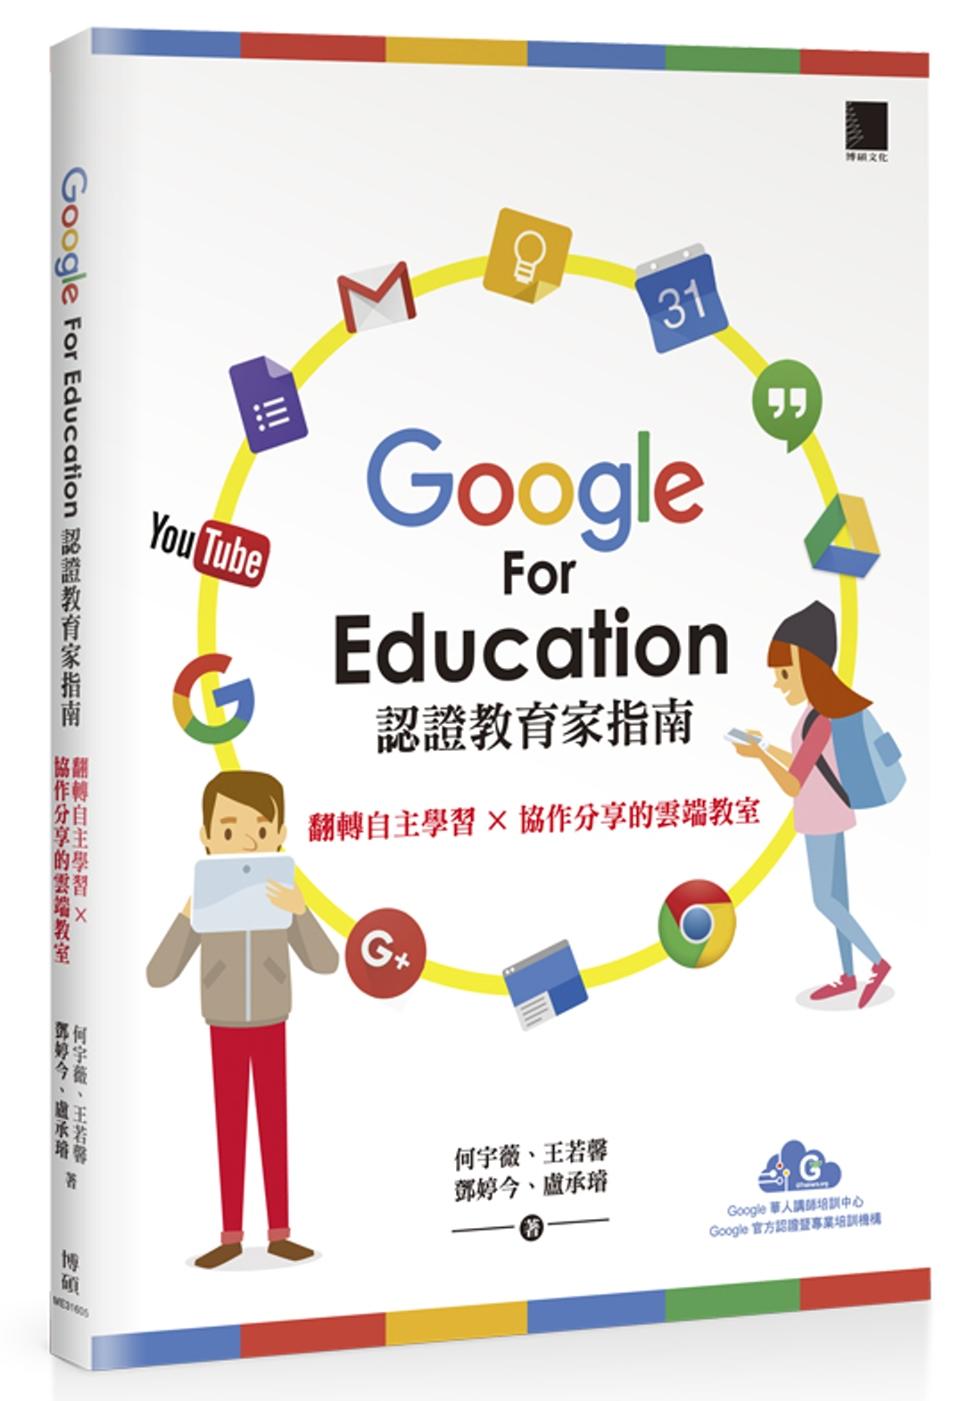 Google For Education認證家教育指南:翻轉自主學習×協作分享的雲端教室